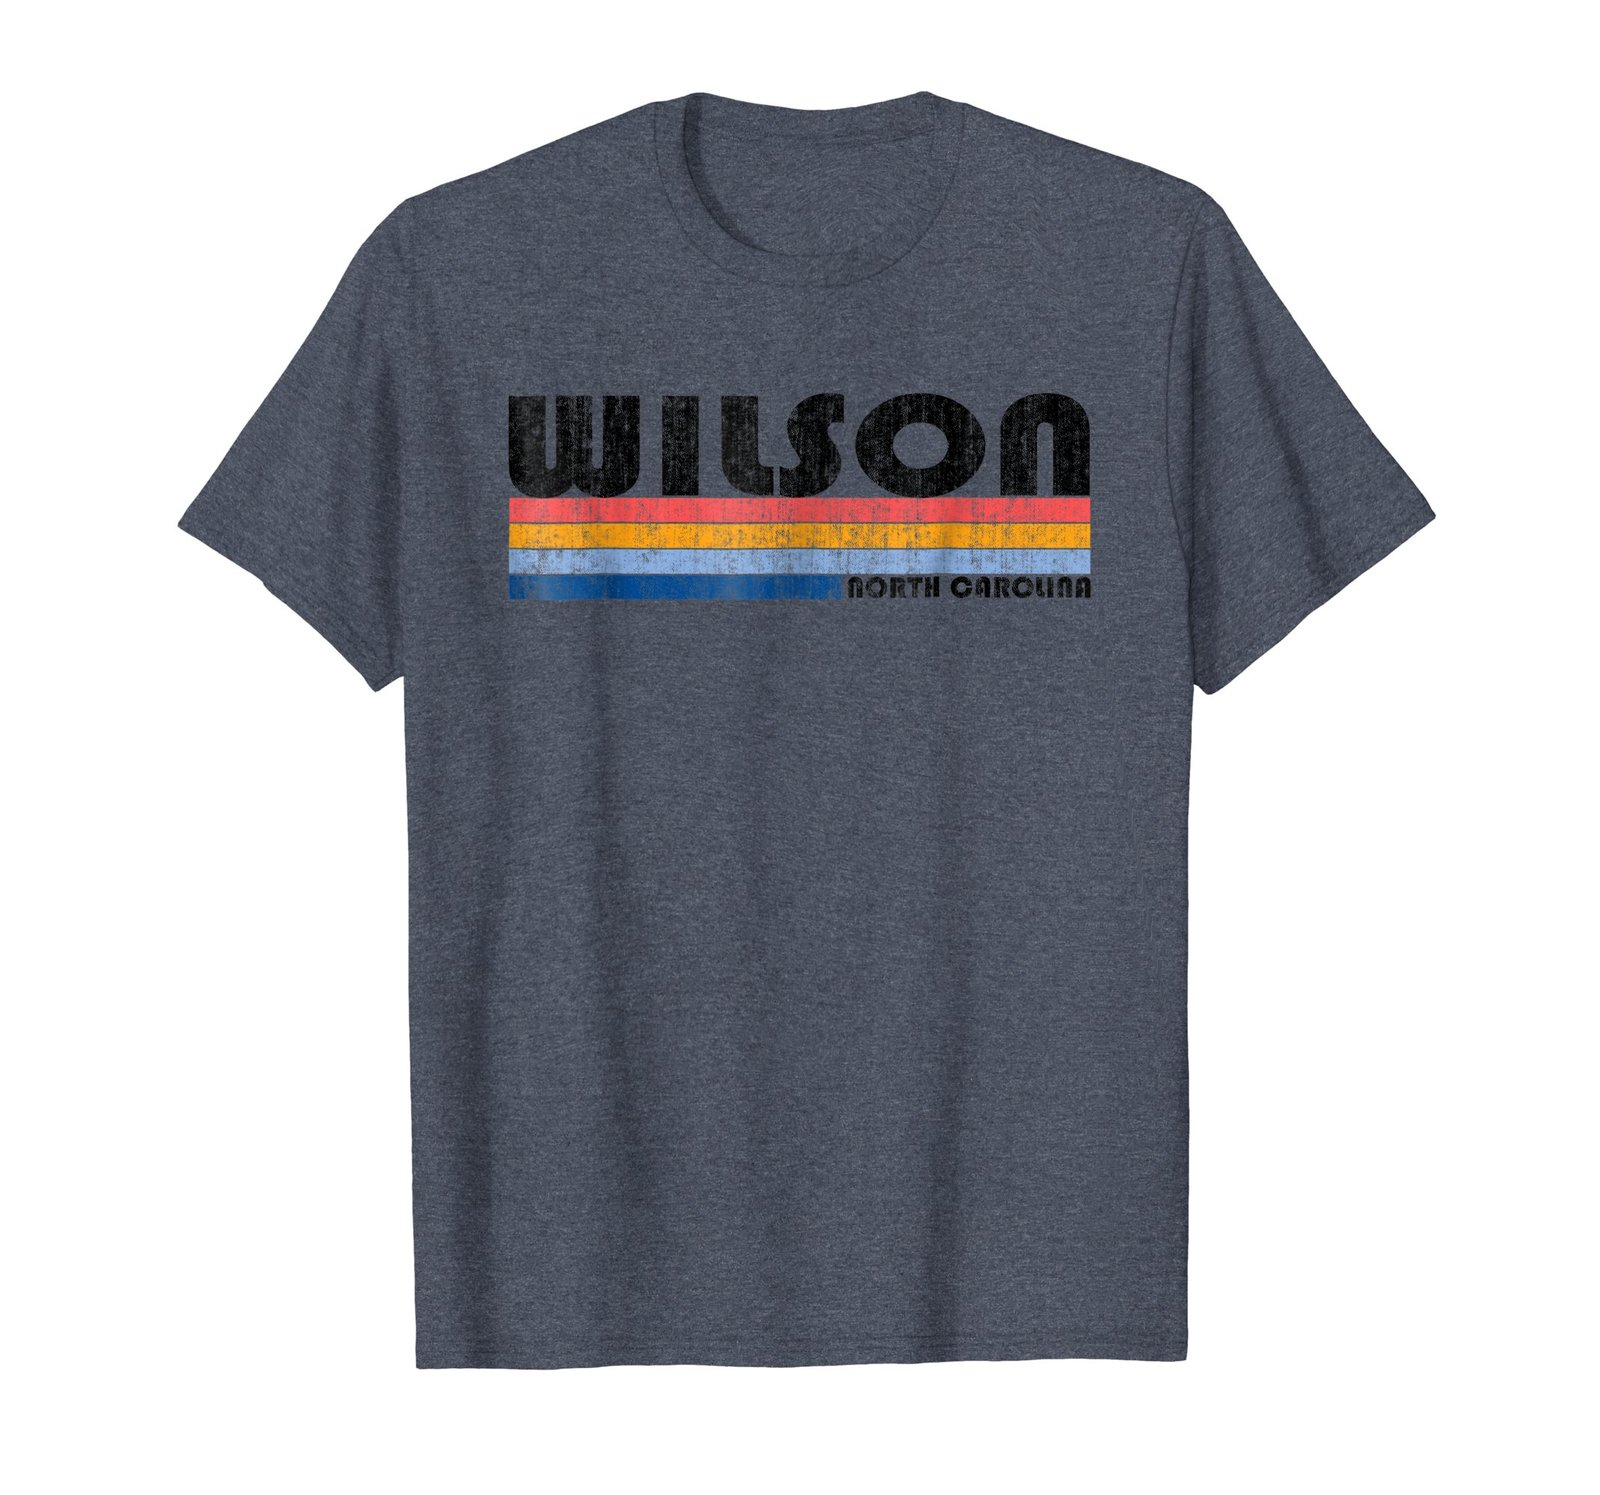 Vintage 1980s Style Wilson NC T Shirt